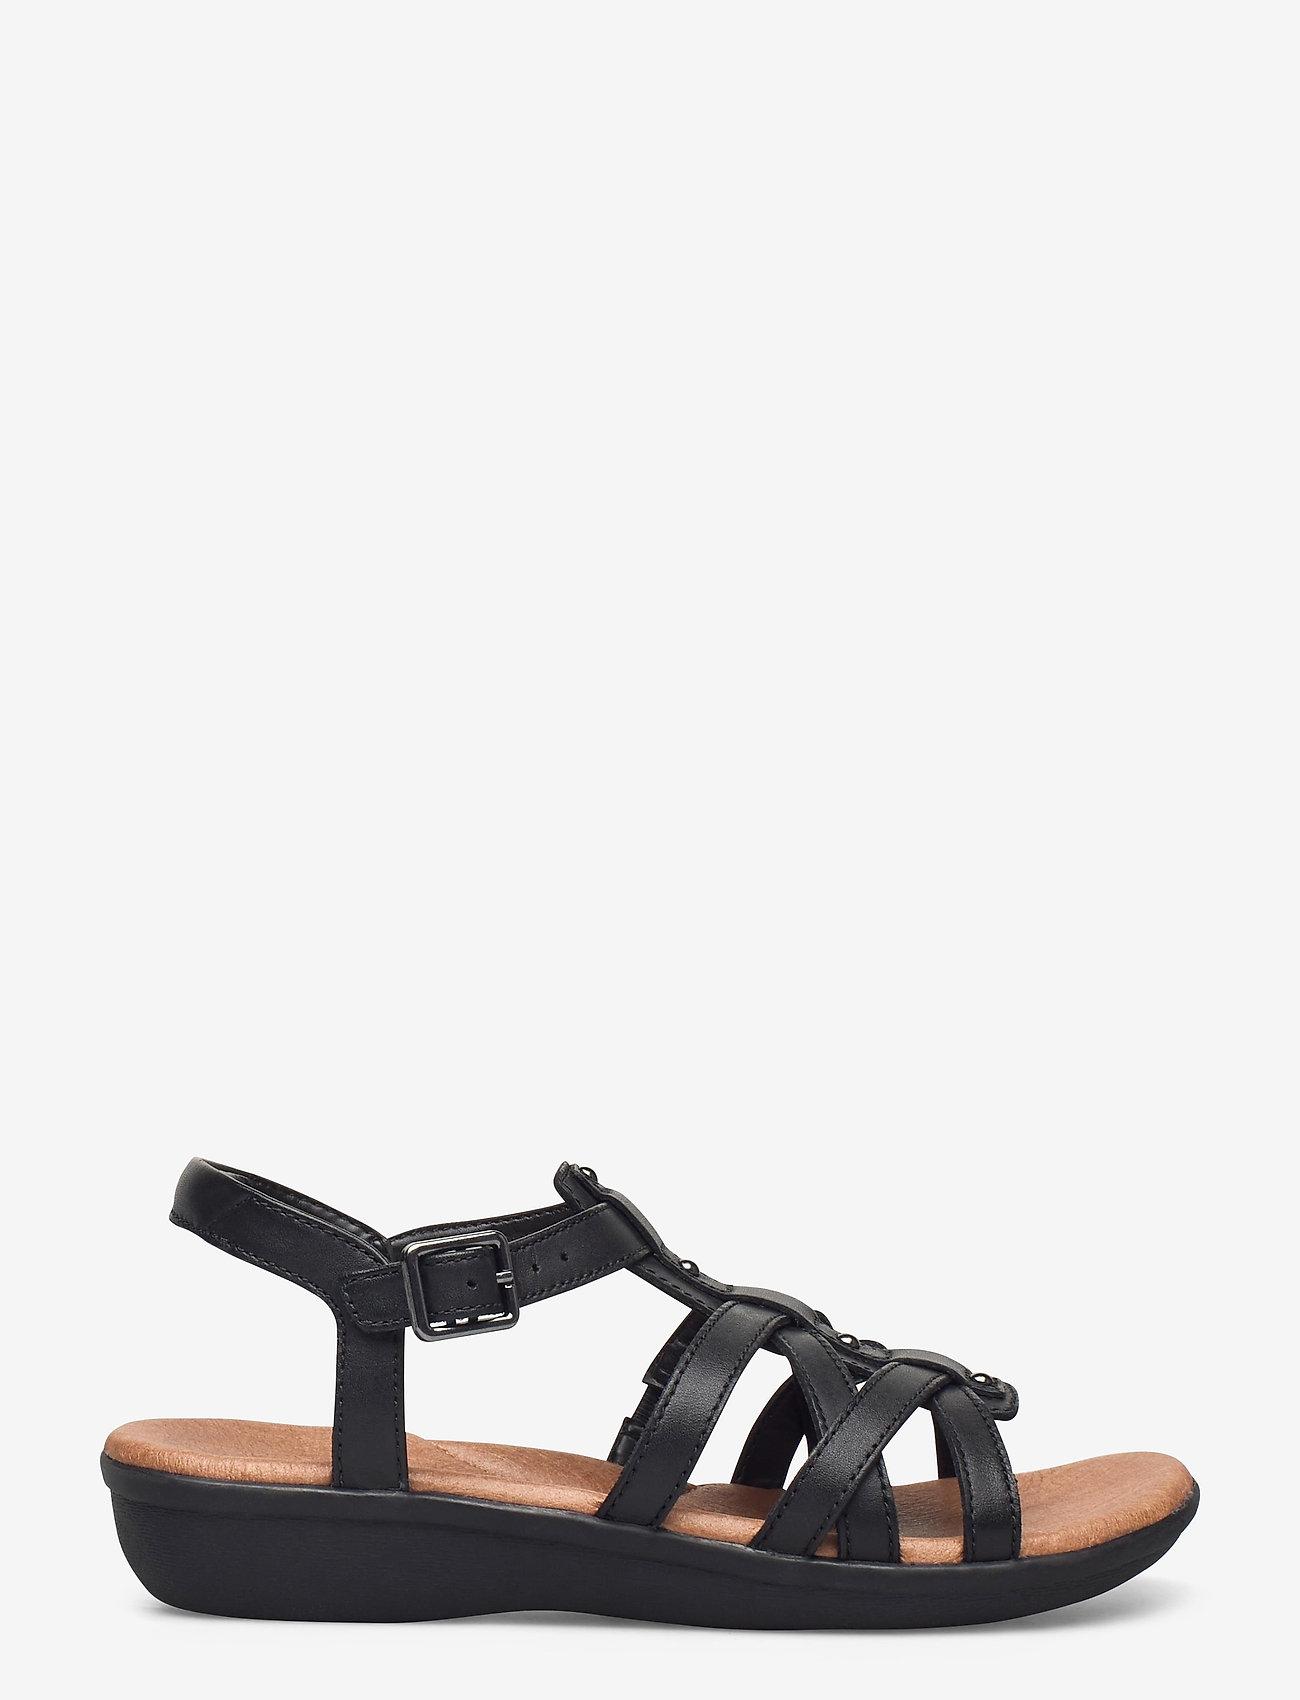 Clarks - Manilla Bonita - platta sandaler - black leather - 1